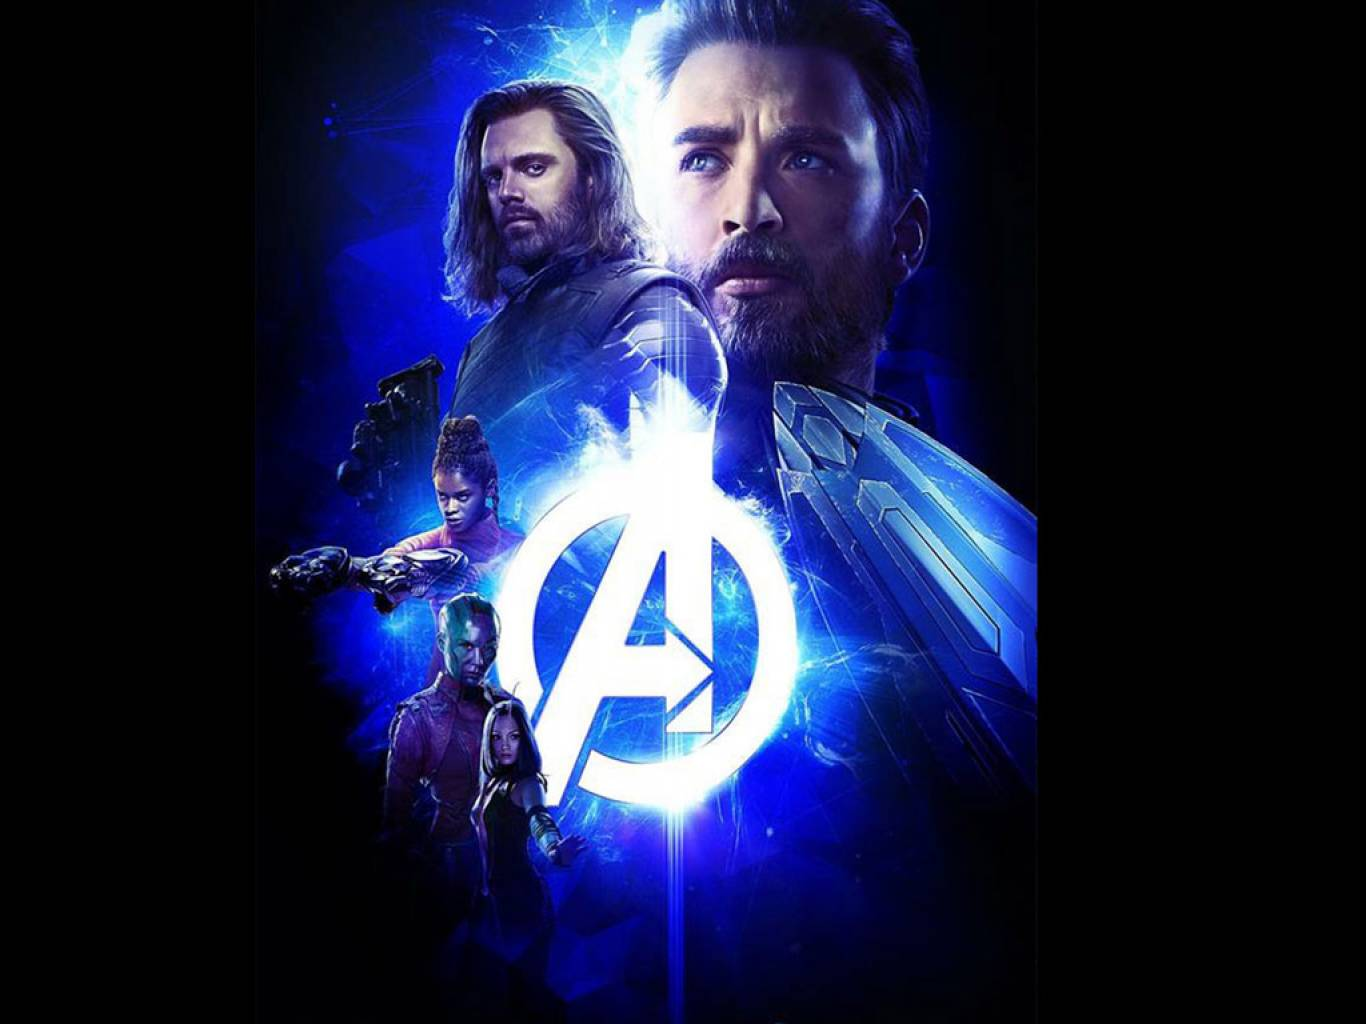 Avengers Infinity War Movie Hd Wallpapers Avengers